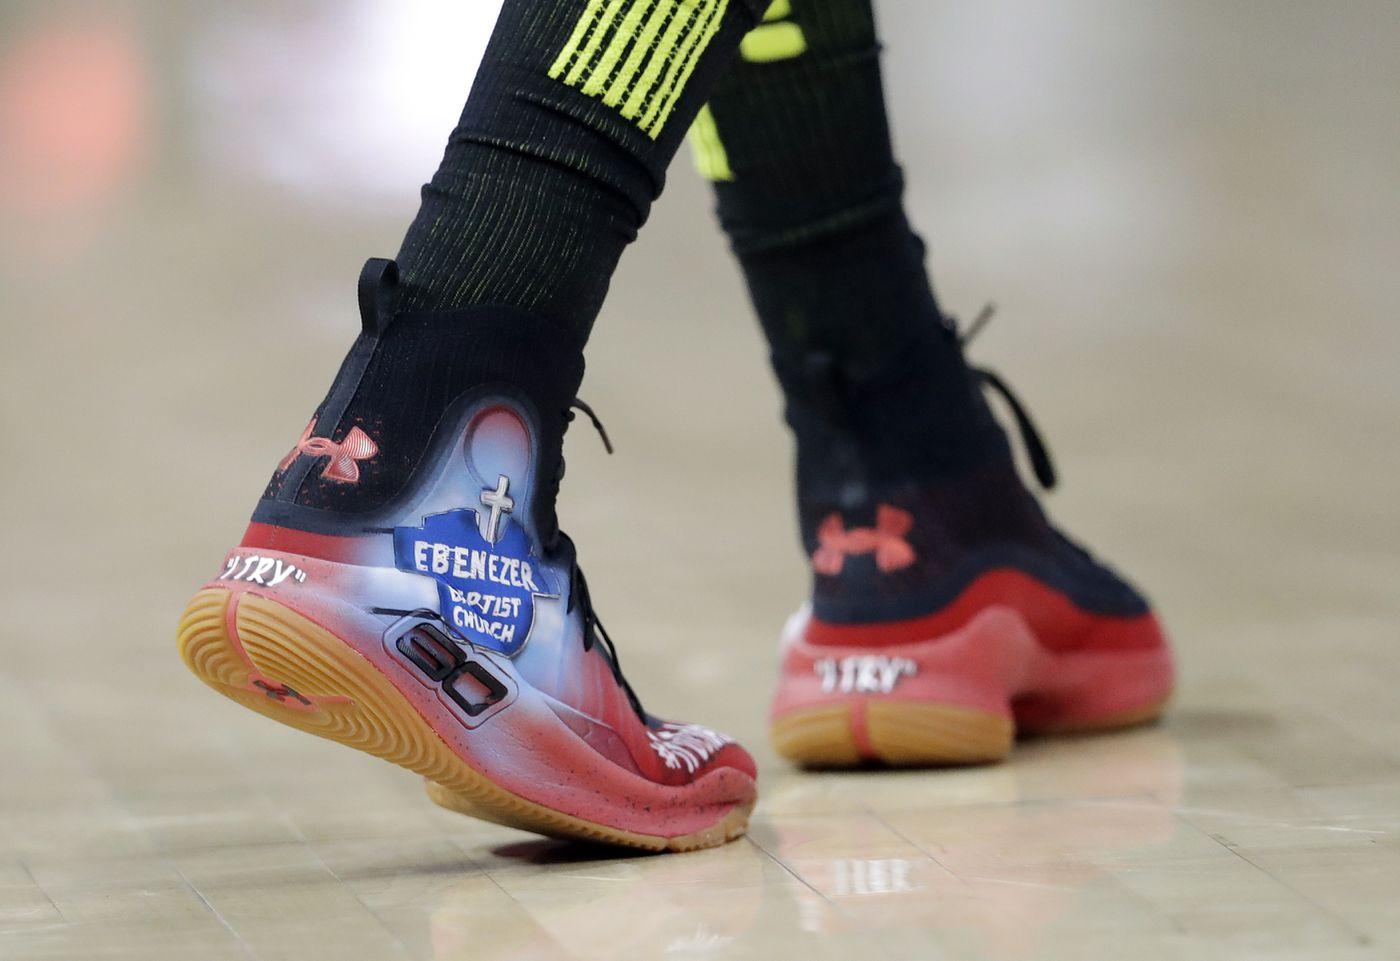 b760ba991e6a Nike s Kaepernick campaign signals change in shoe politics